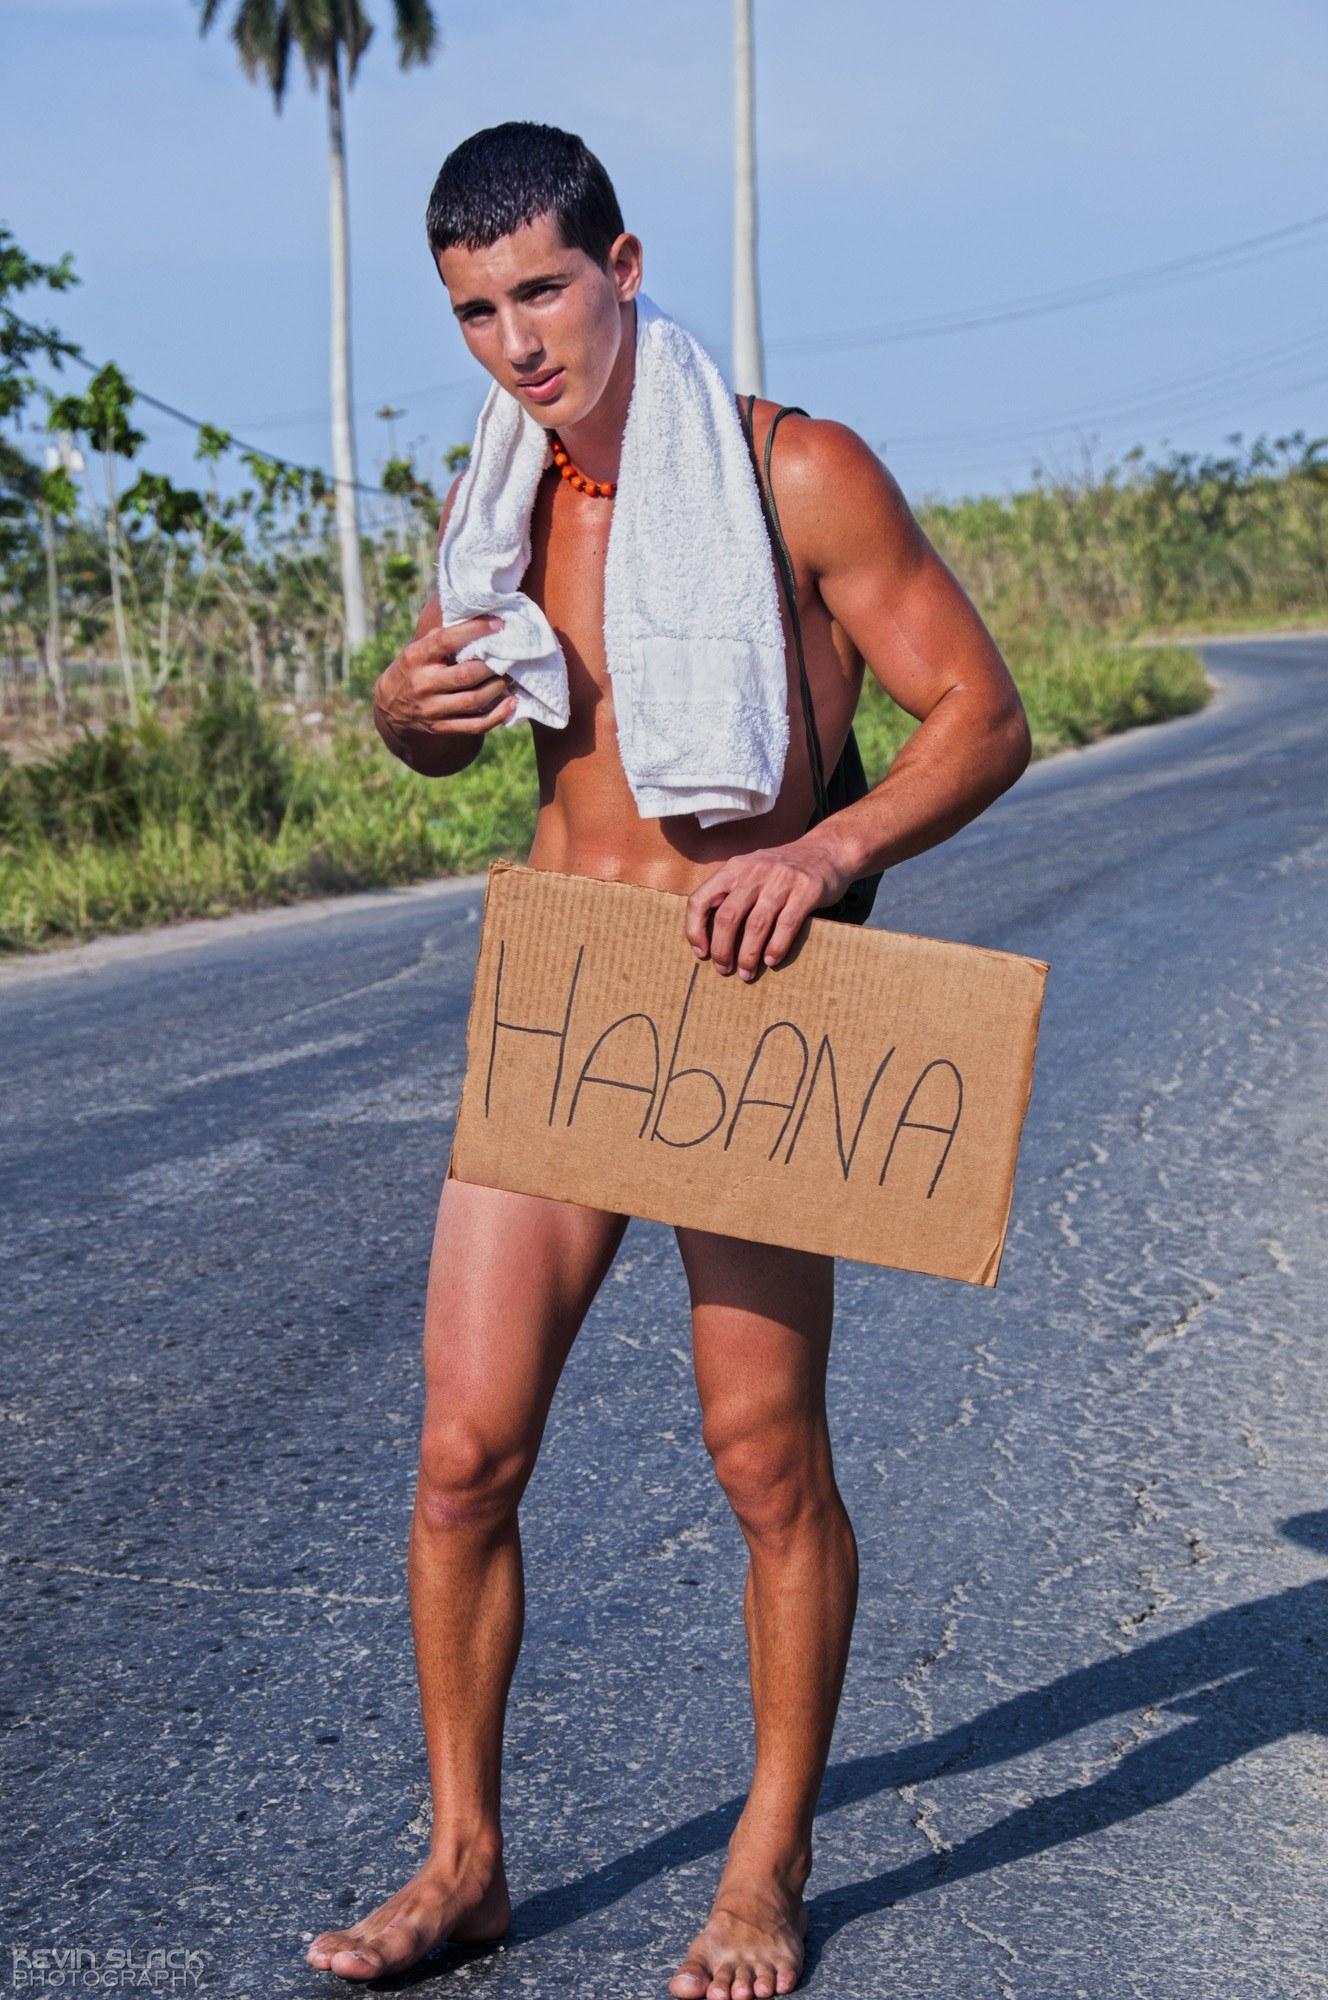 Hitchhike Habana Outtakes #17